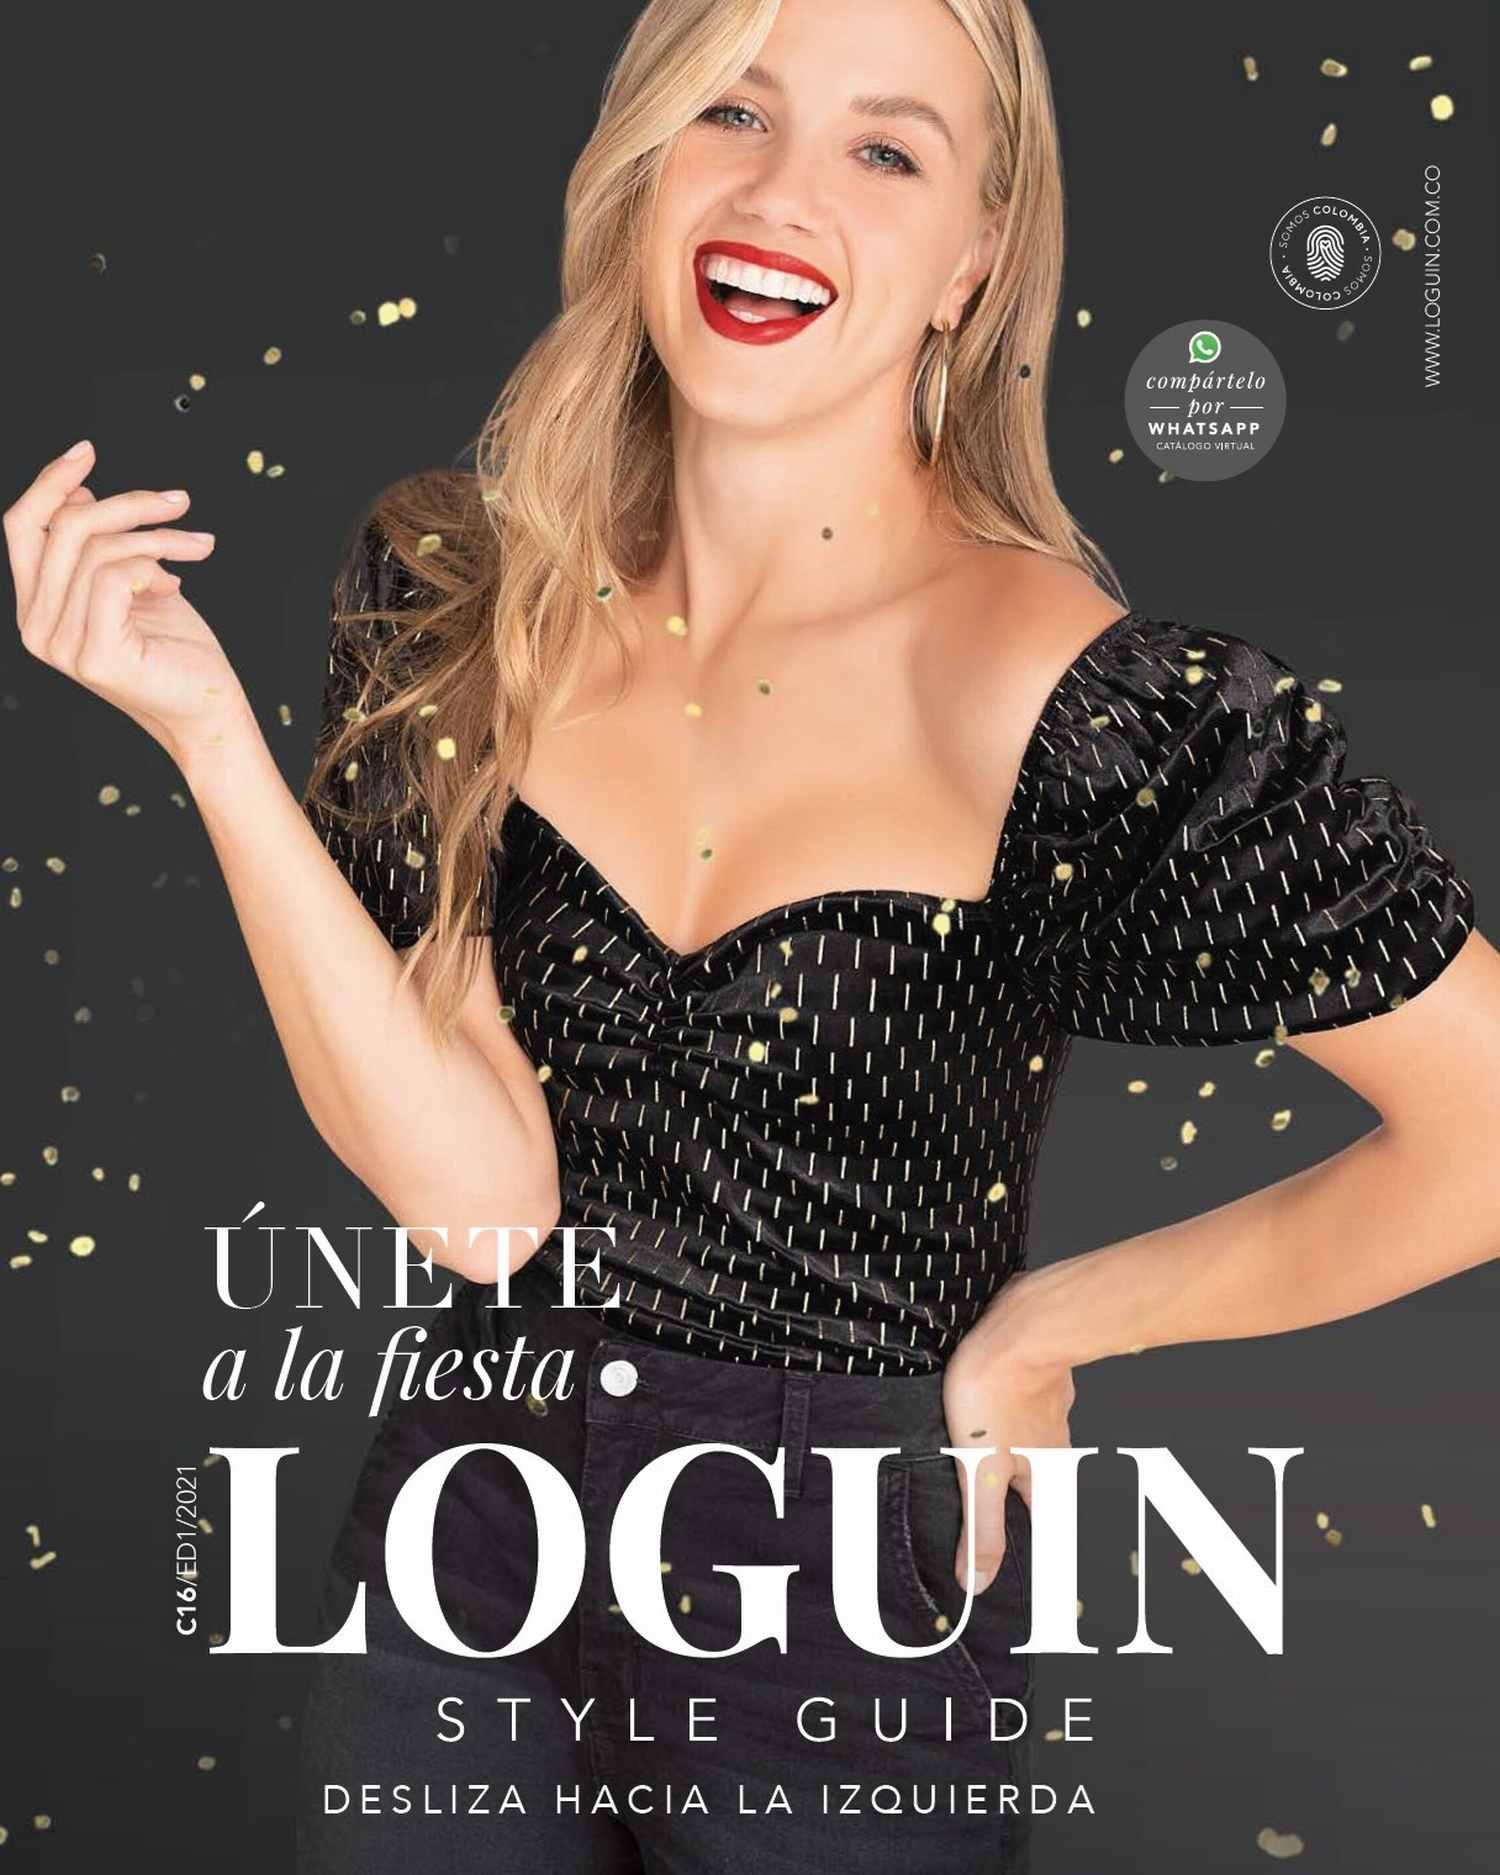 Catálogo Loguin Campaña 16 Ed1 2021 Colombia